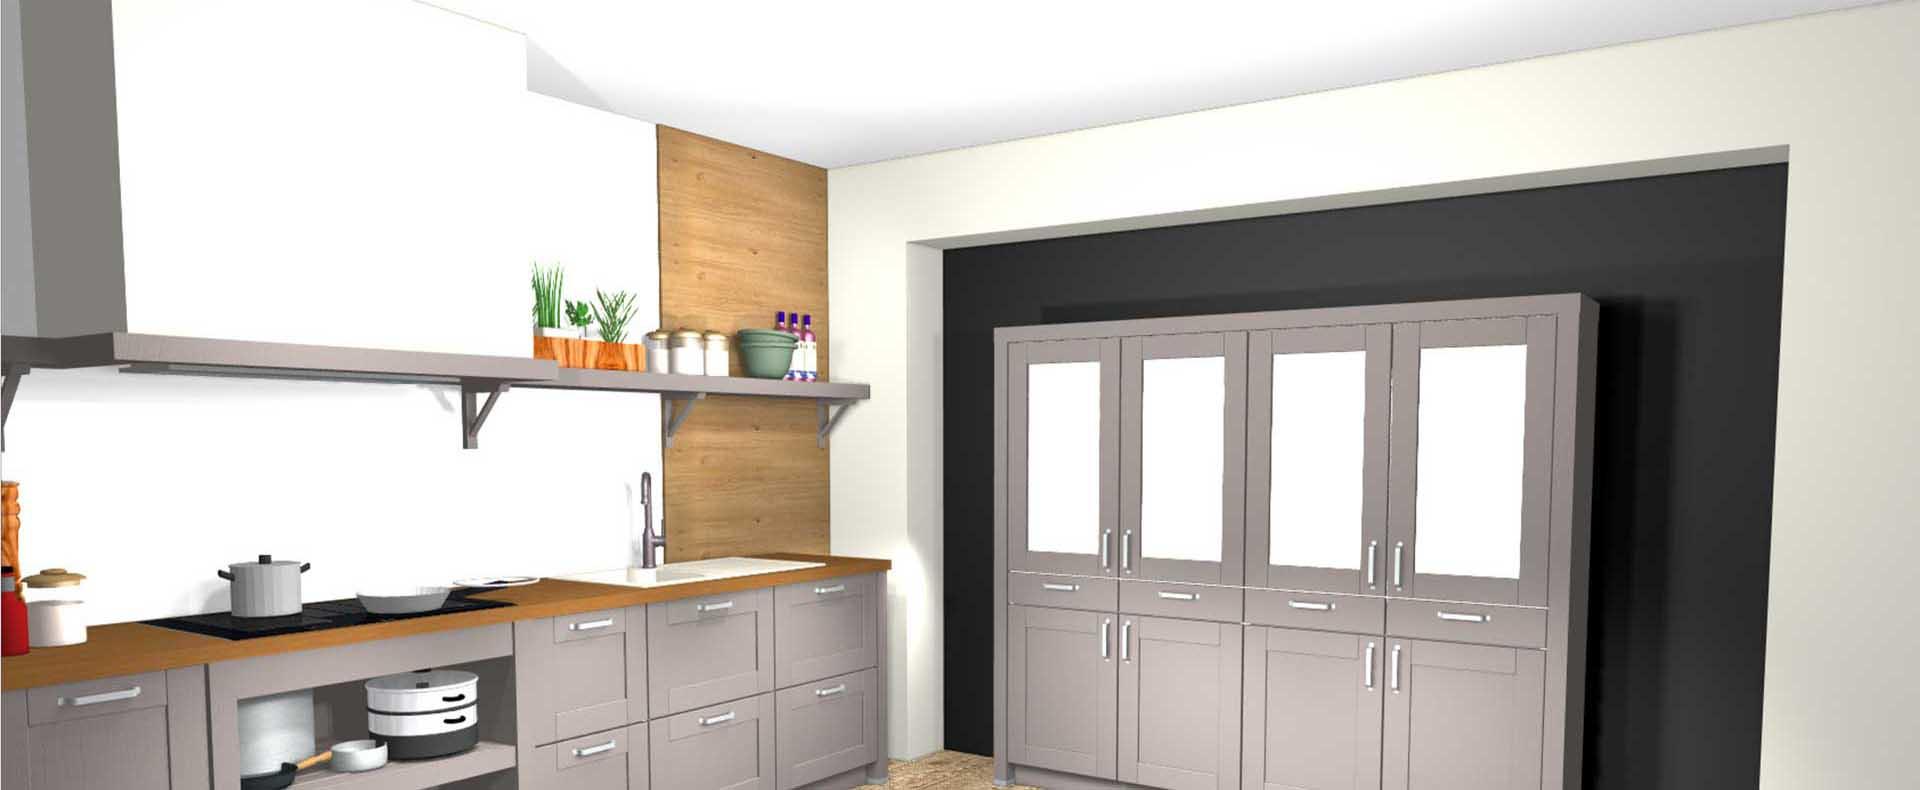 k chenplanung in t nisvorst nahe im raum krefeld m nchengladbach kempen m bel klauth. Black Bedroom Furniture Sets. Home Design Ideas